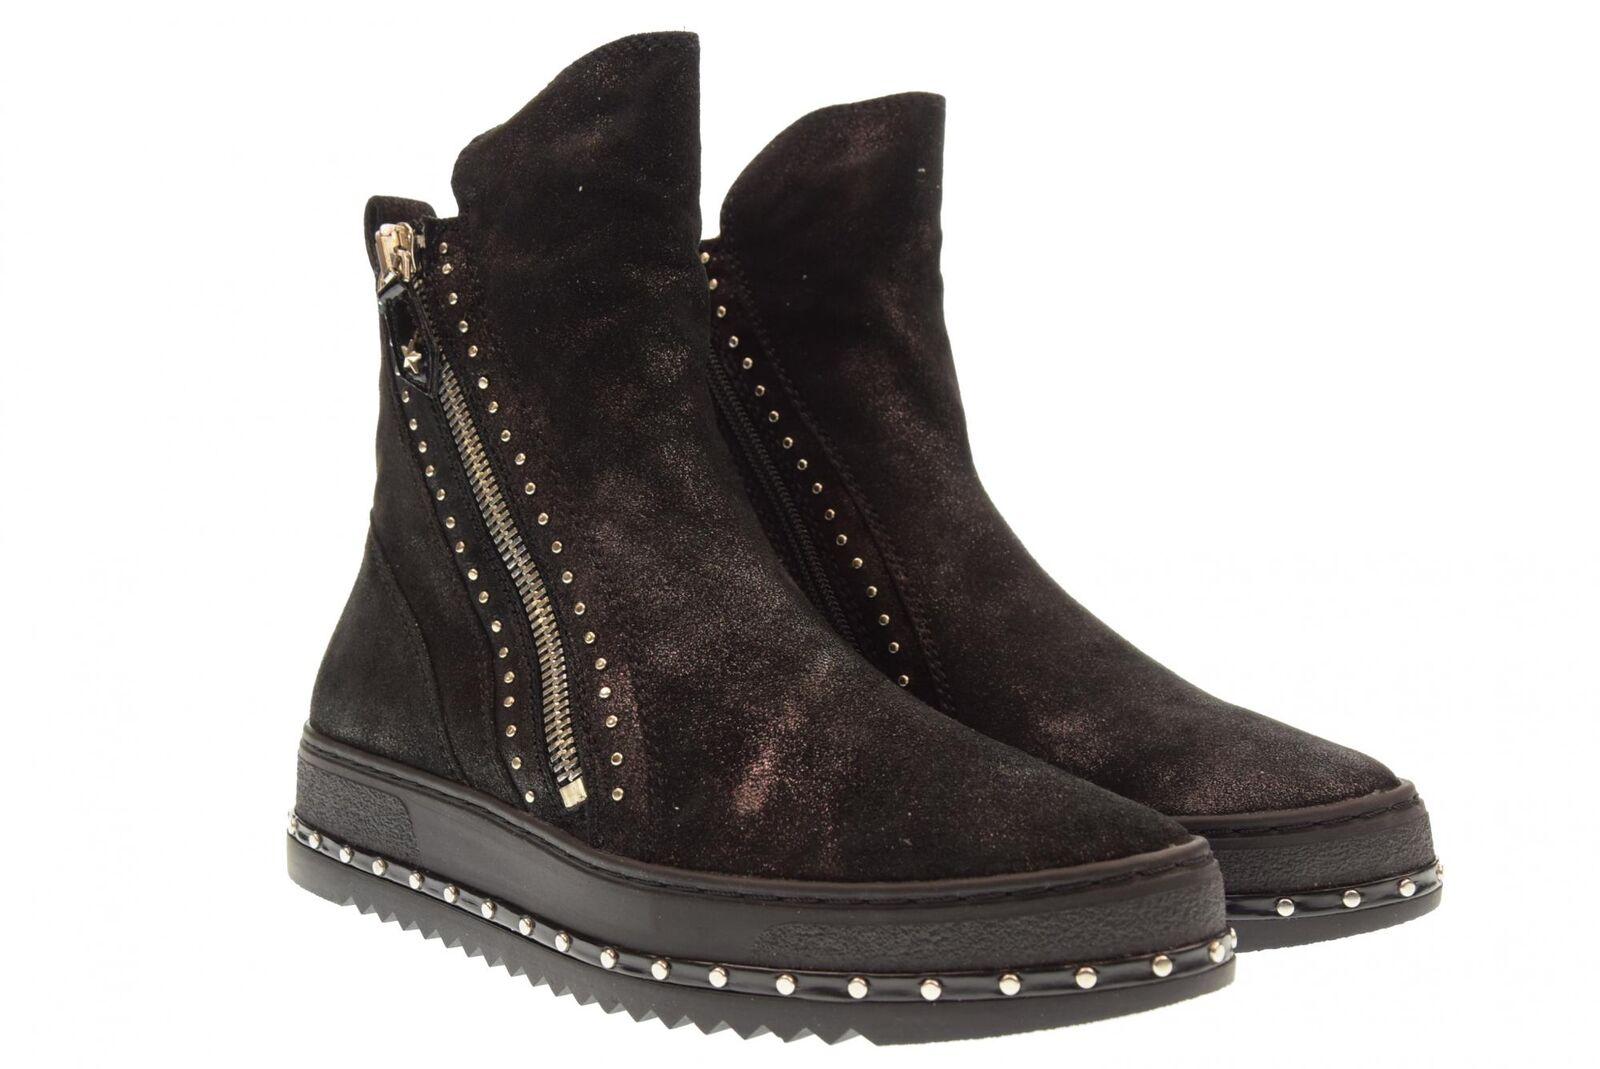 Altraofficina a18g Chaussures Femmes Bottines Avec Plate-forme t1804x